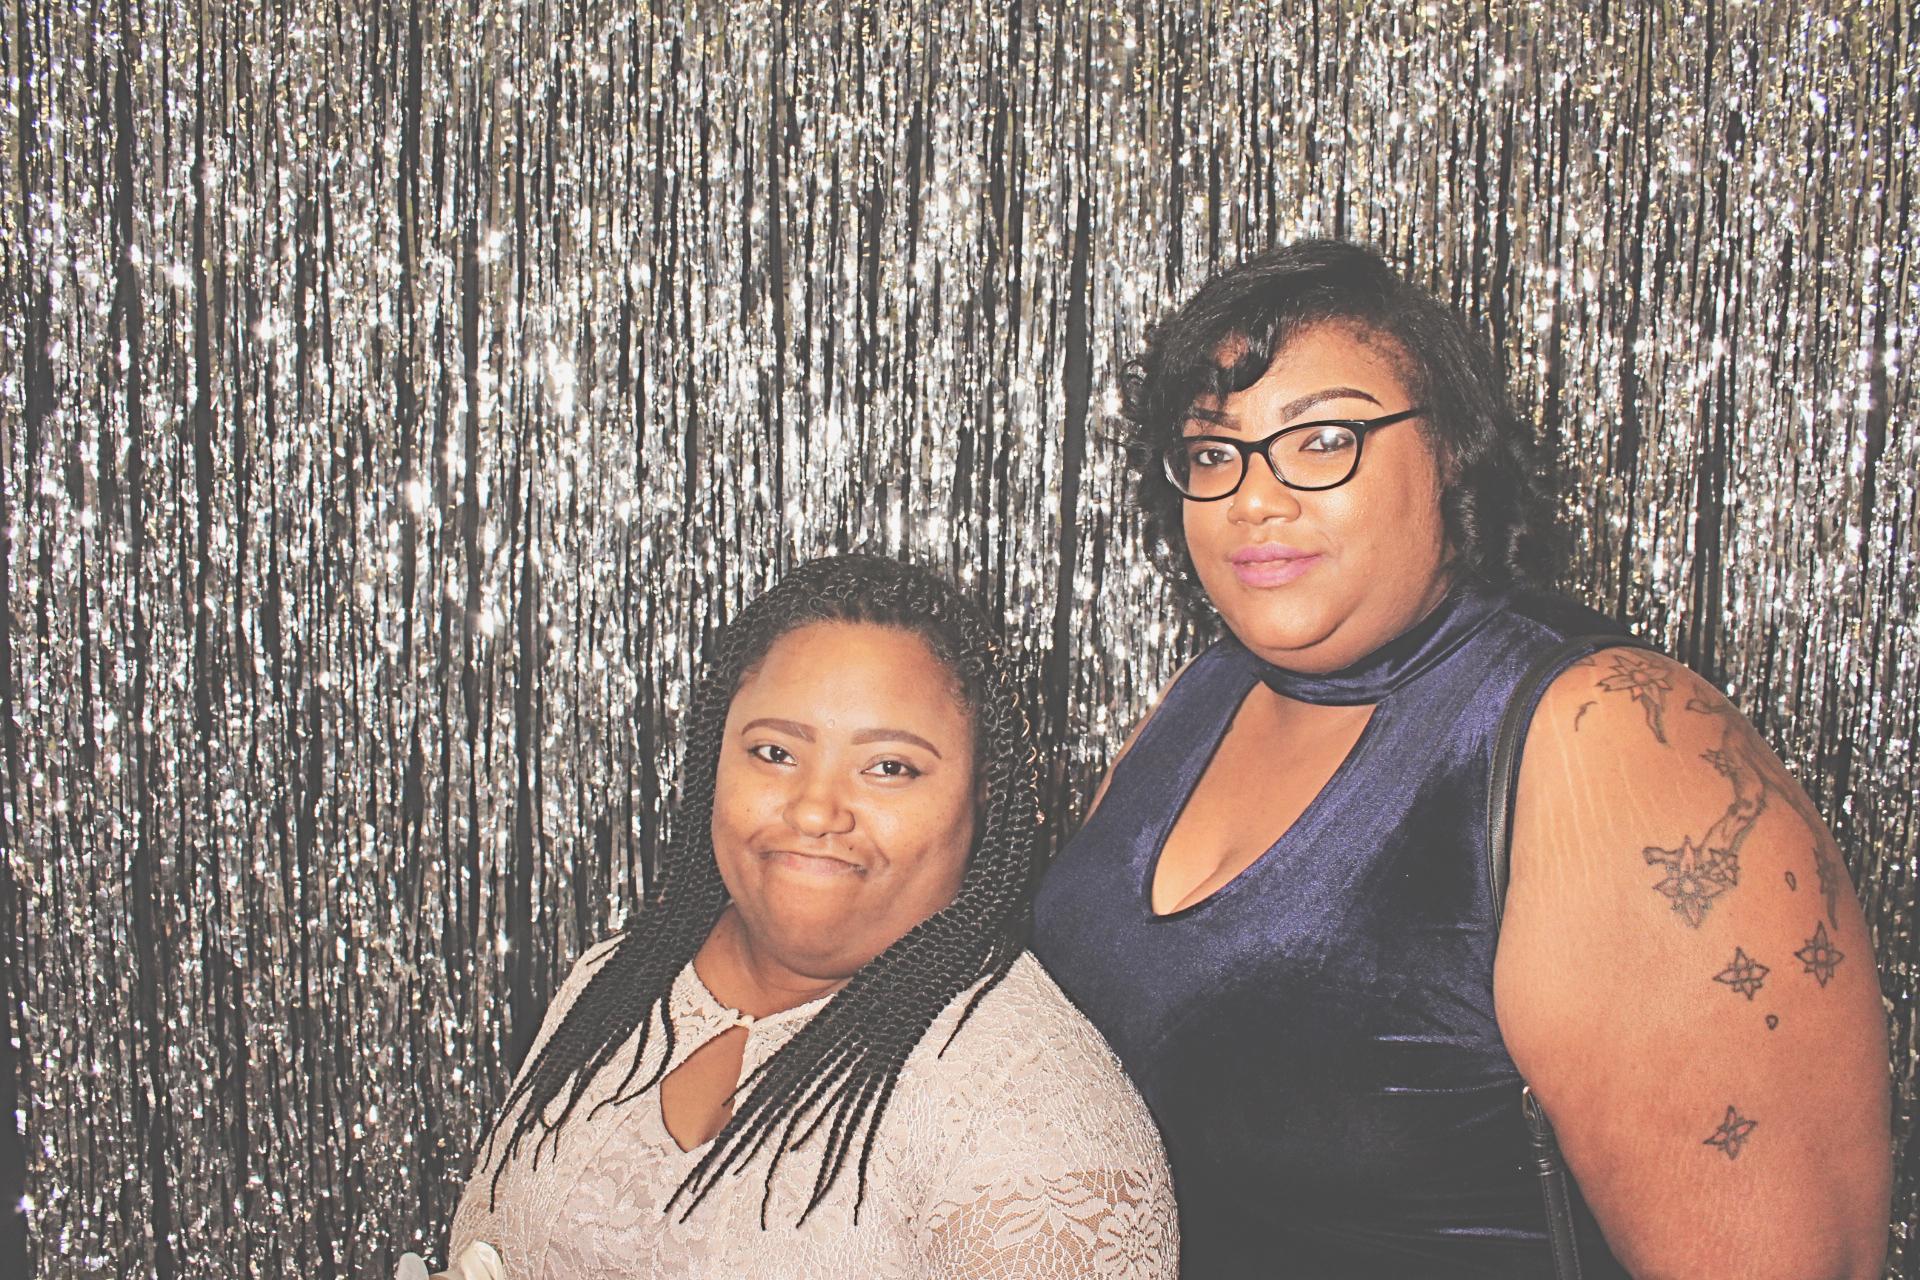 2-8-19 Atlanta Southcrest Church Photo Booth - Night to Shine Coweta 2019 - Robot Booth095.jpg